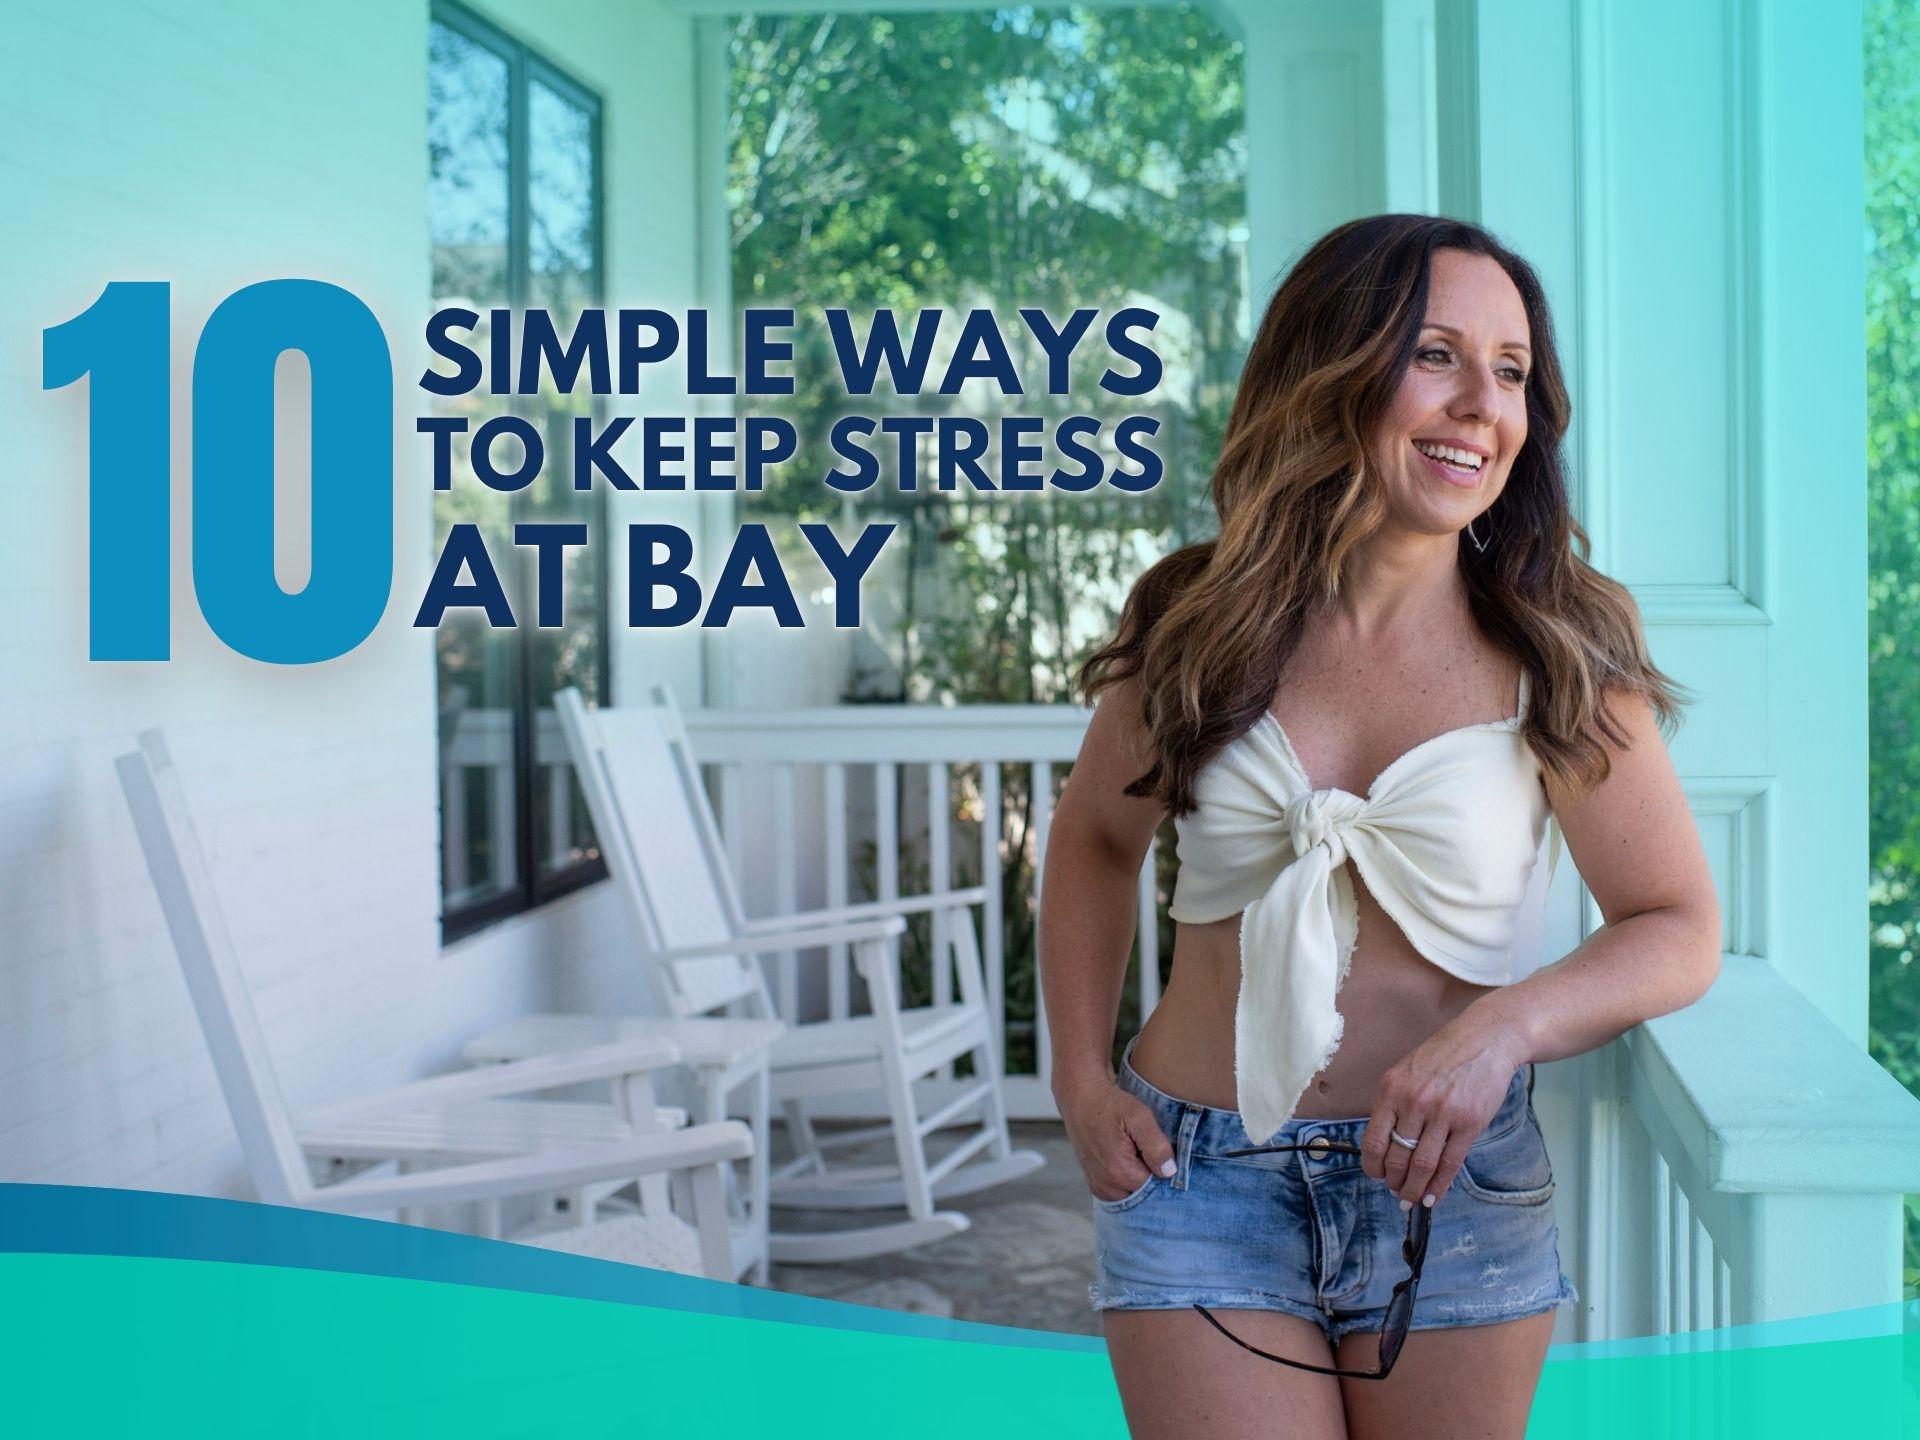 10 Simple Ways to Keep Stress at Bay